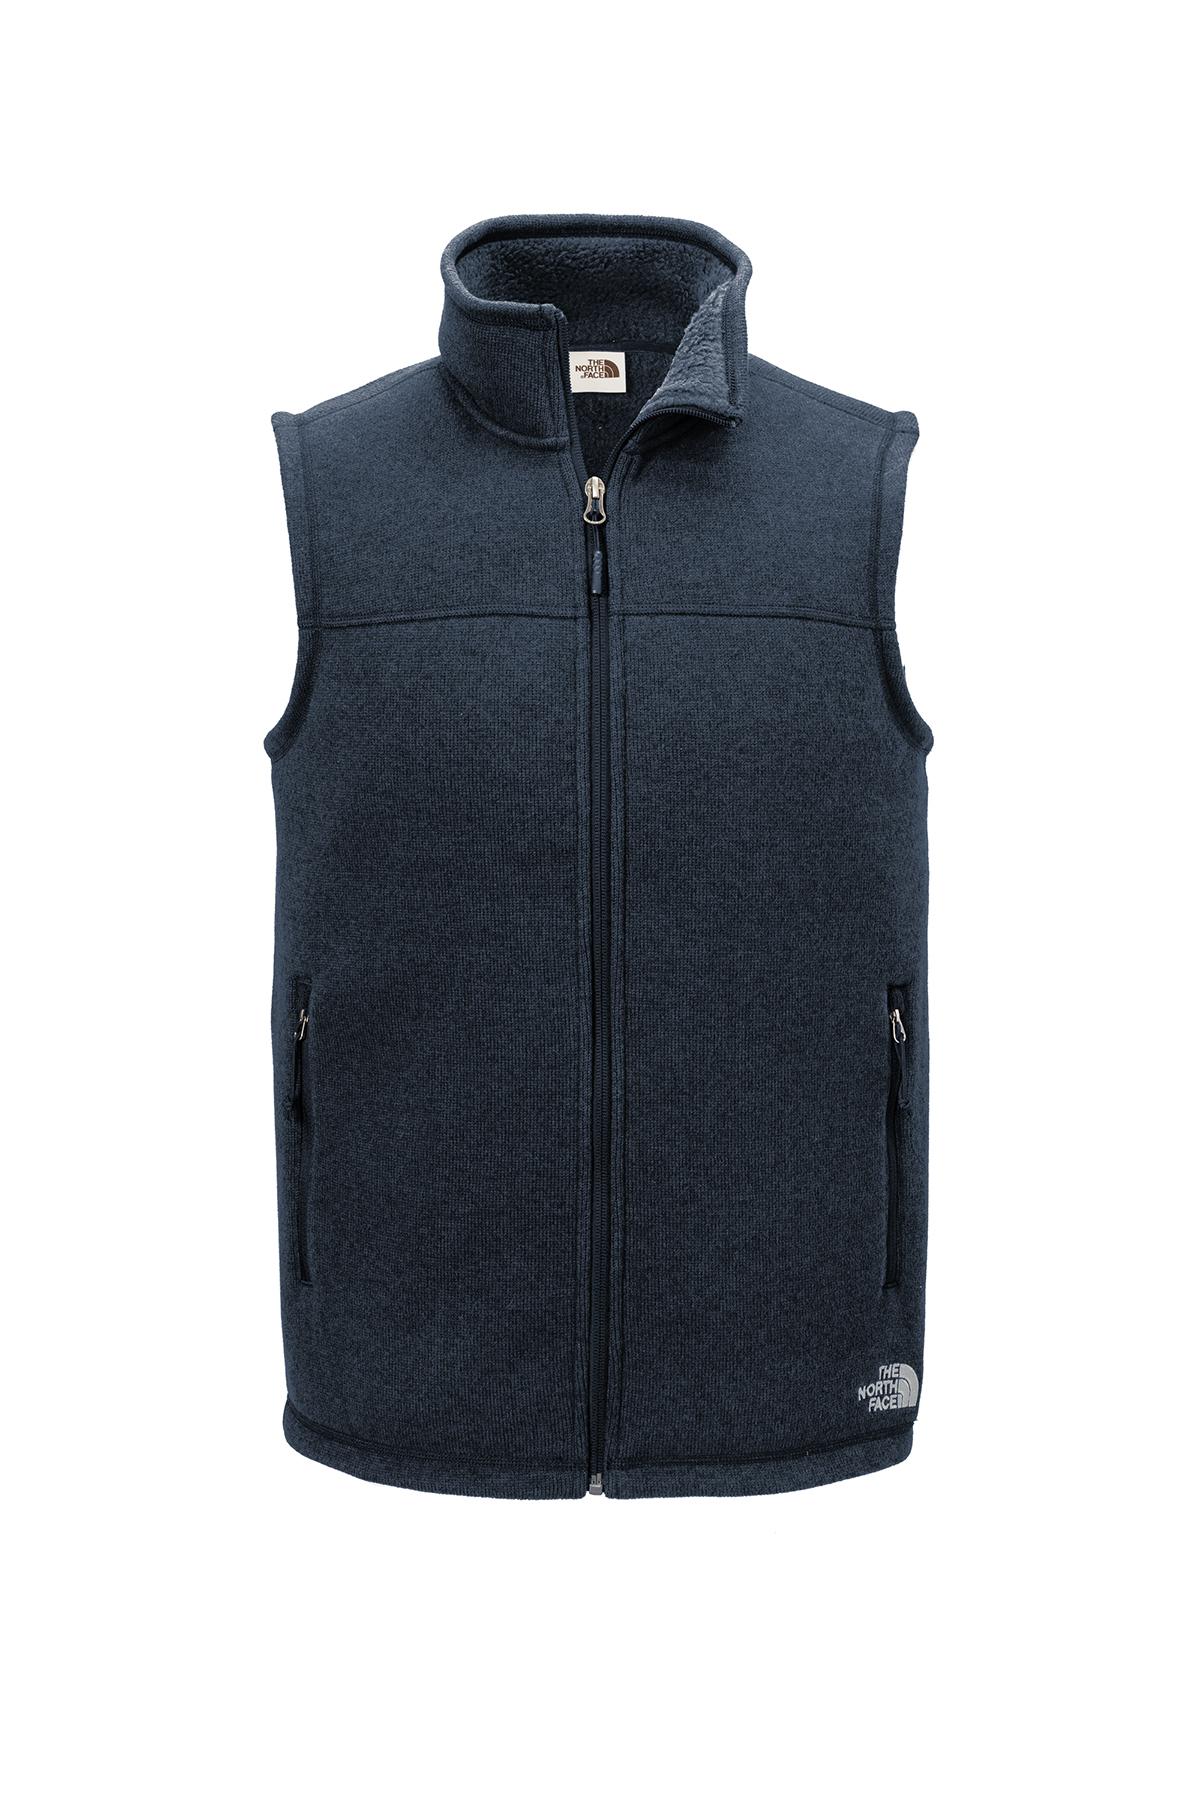 f6e387fc8 The North Face ® Sweater Fleece Vest | Vests | Outerwear | SanMar